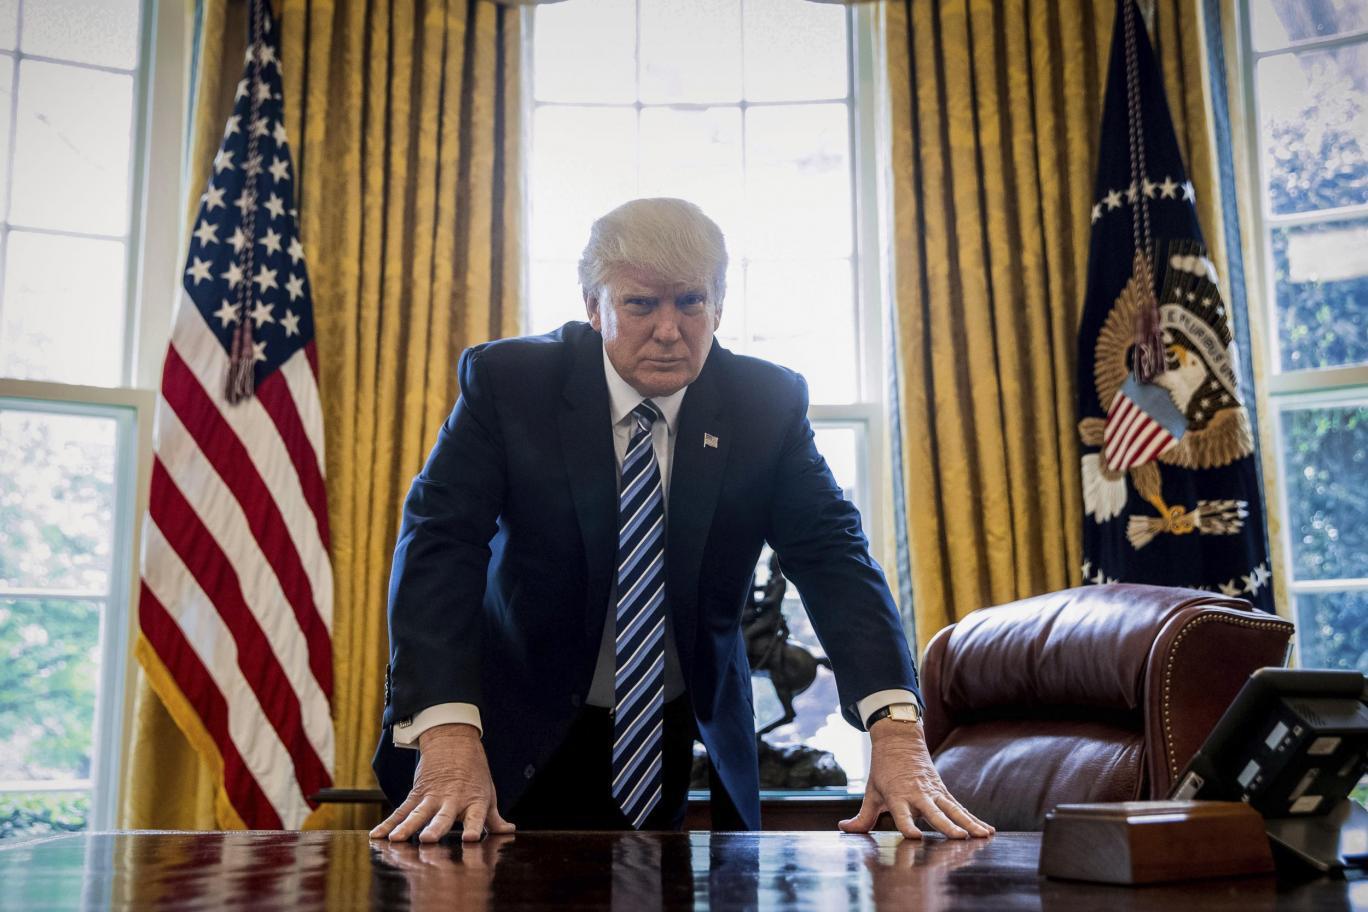 Названа главная причина тревоги по поводу Трампа